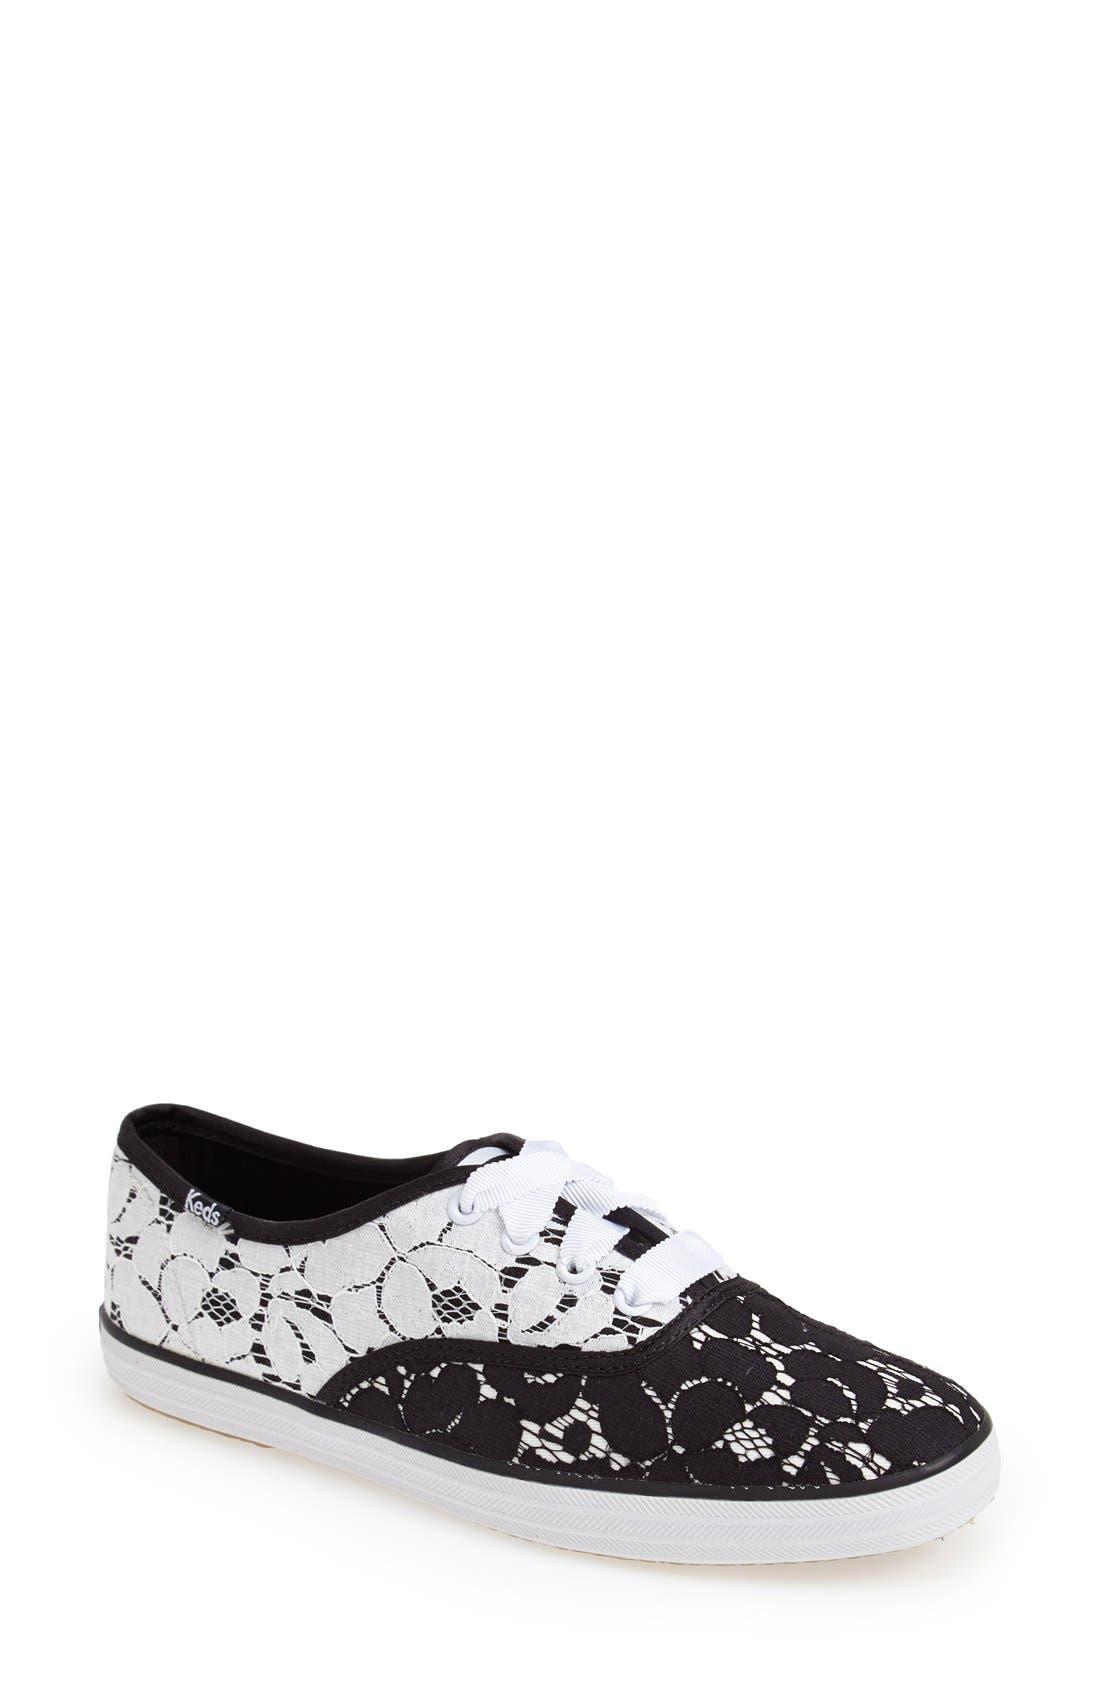 Alternate Image 1 Selected - Keds® 'Champion - Lace' Sneaker (Women)